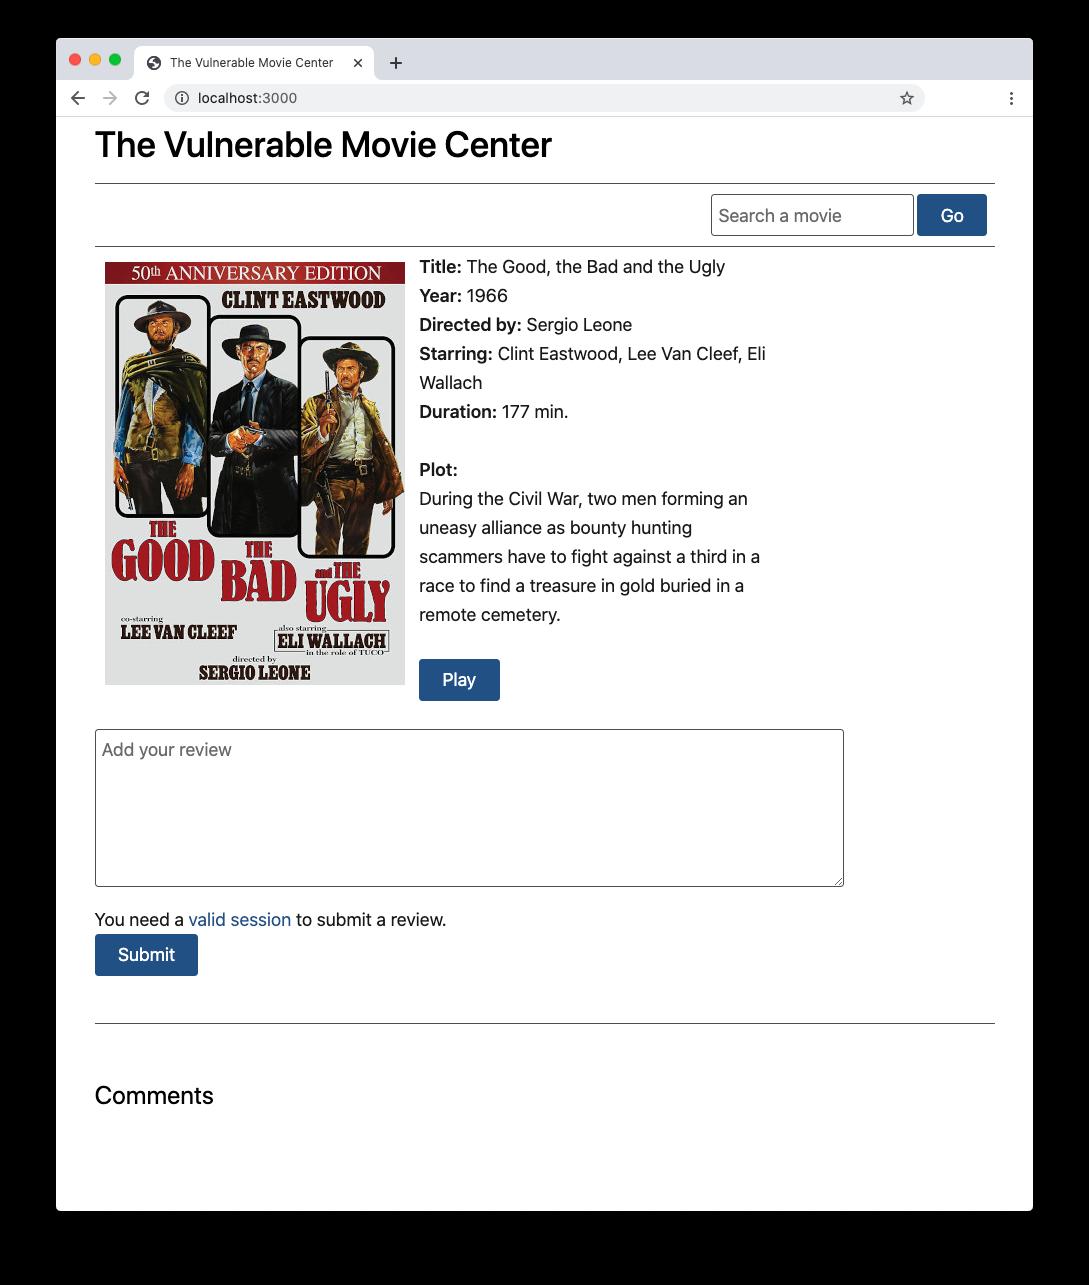 The CSRF vulnerable website